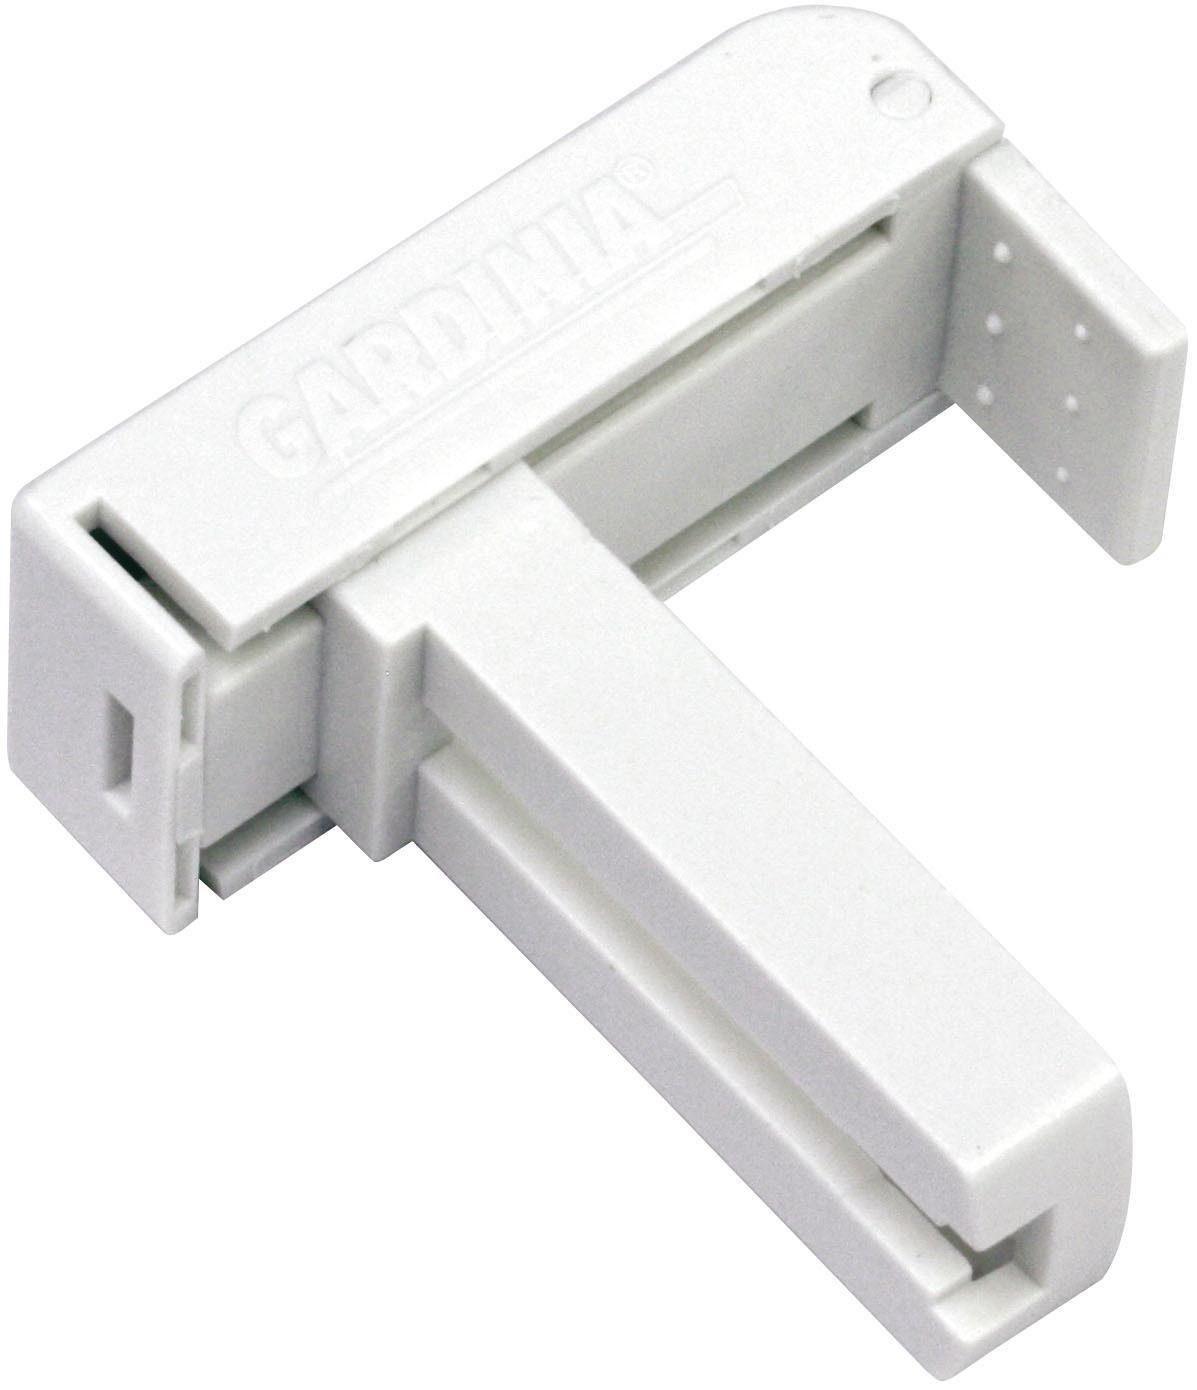 Klemmträger, Gardinia, für Aluminium-Jalousie 25 mm (2 Stück)